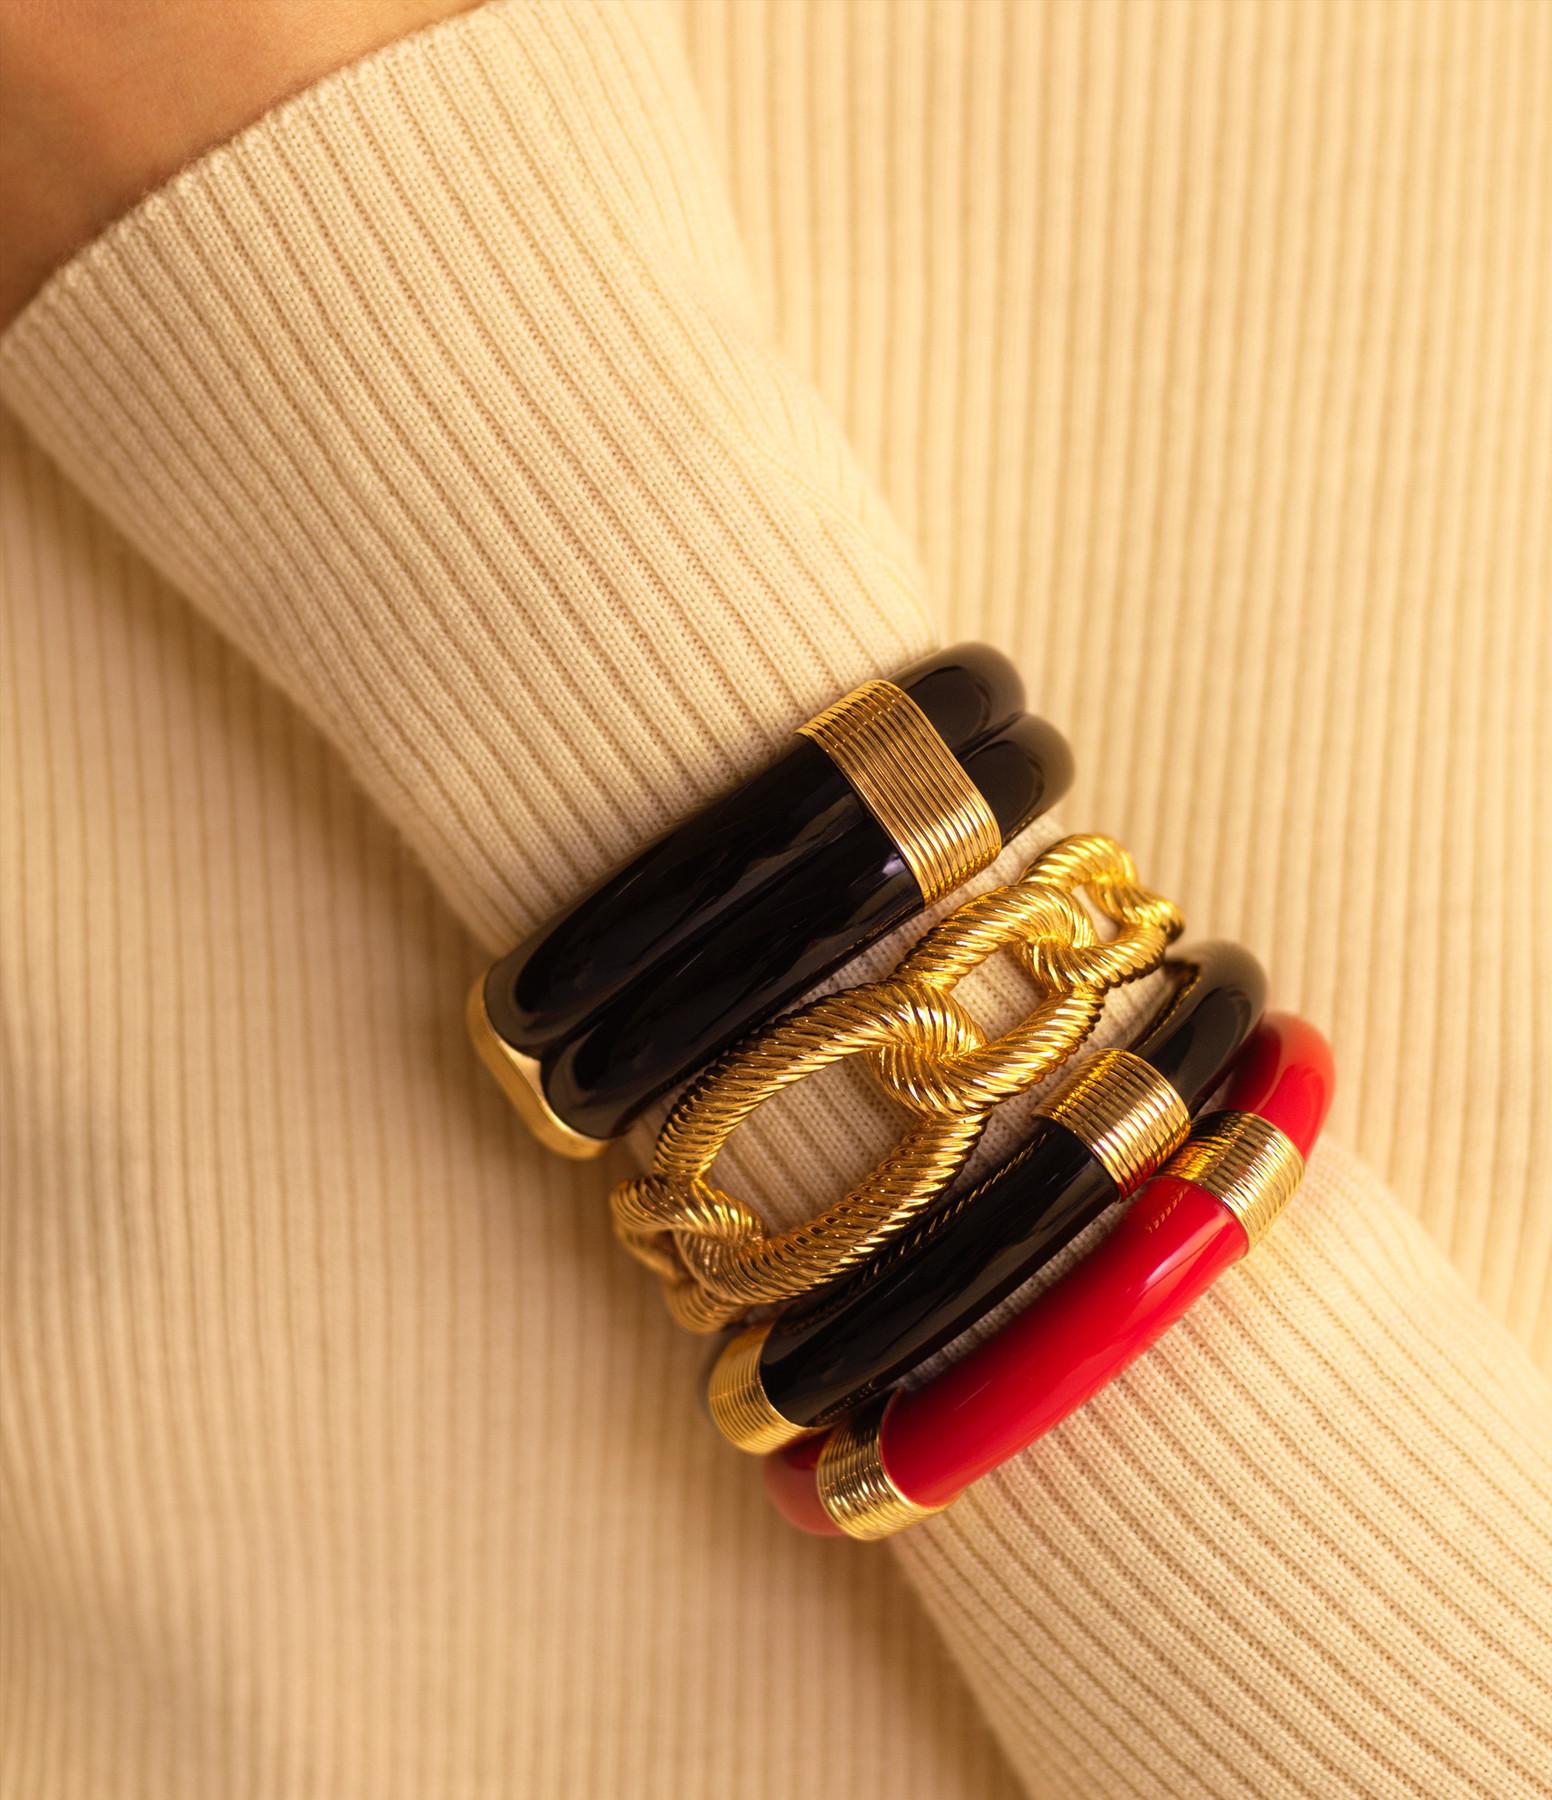 AURELIE BIDERMANN - Bracelet Katt PM Résine Rouge